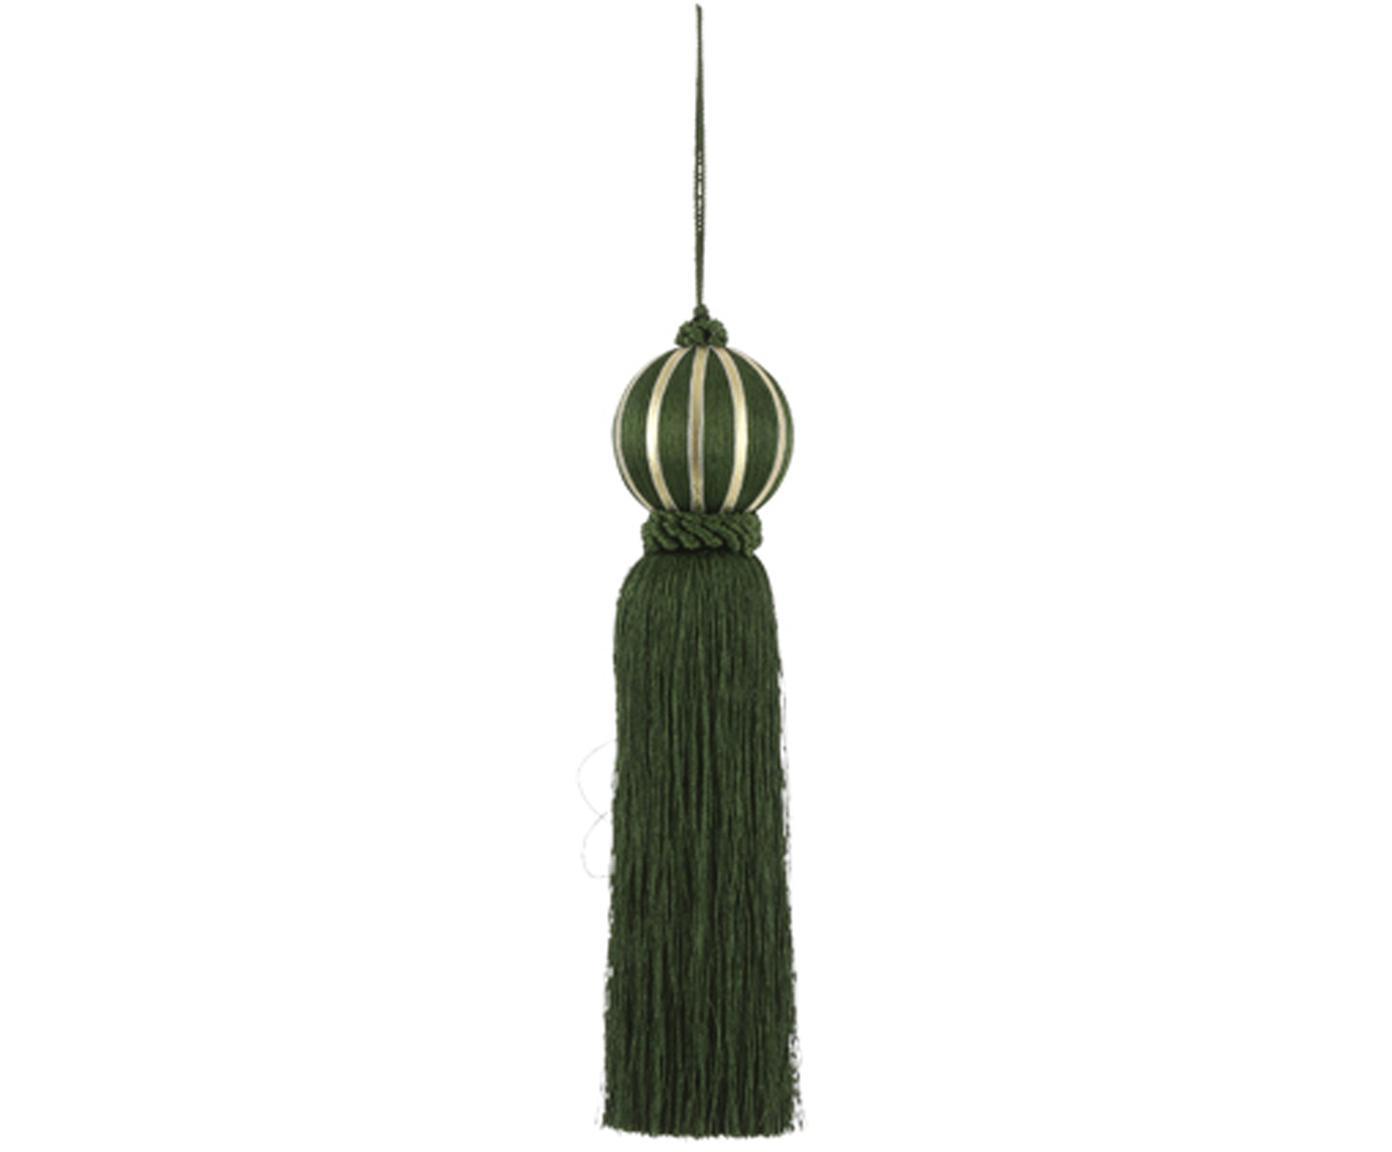 Decoratieve hangers Asena, 2 stuks, Polyester, Donkergroen, Ø 6 x H 27 cm